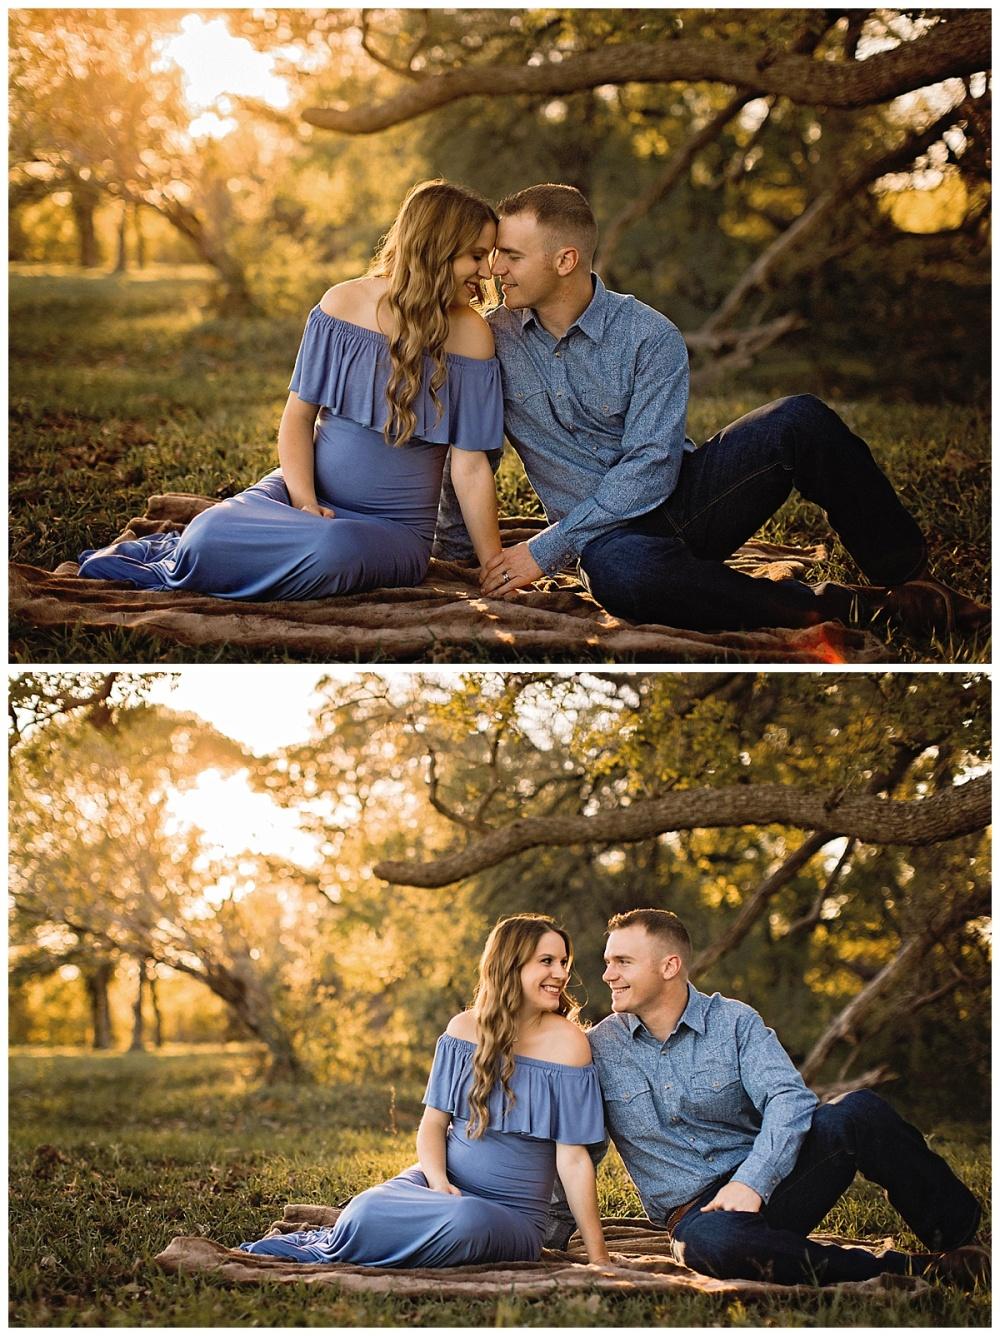 Carly-Barton-Photography-Geronimo-Oaks-Wedding-Venue-Texas-Hill-Country-Ronnie-Sarah_0136.jpg